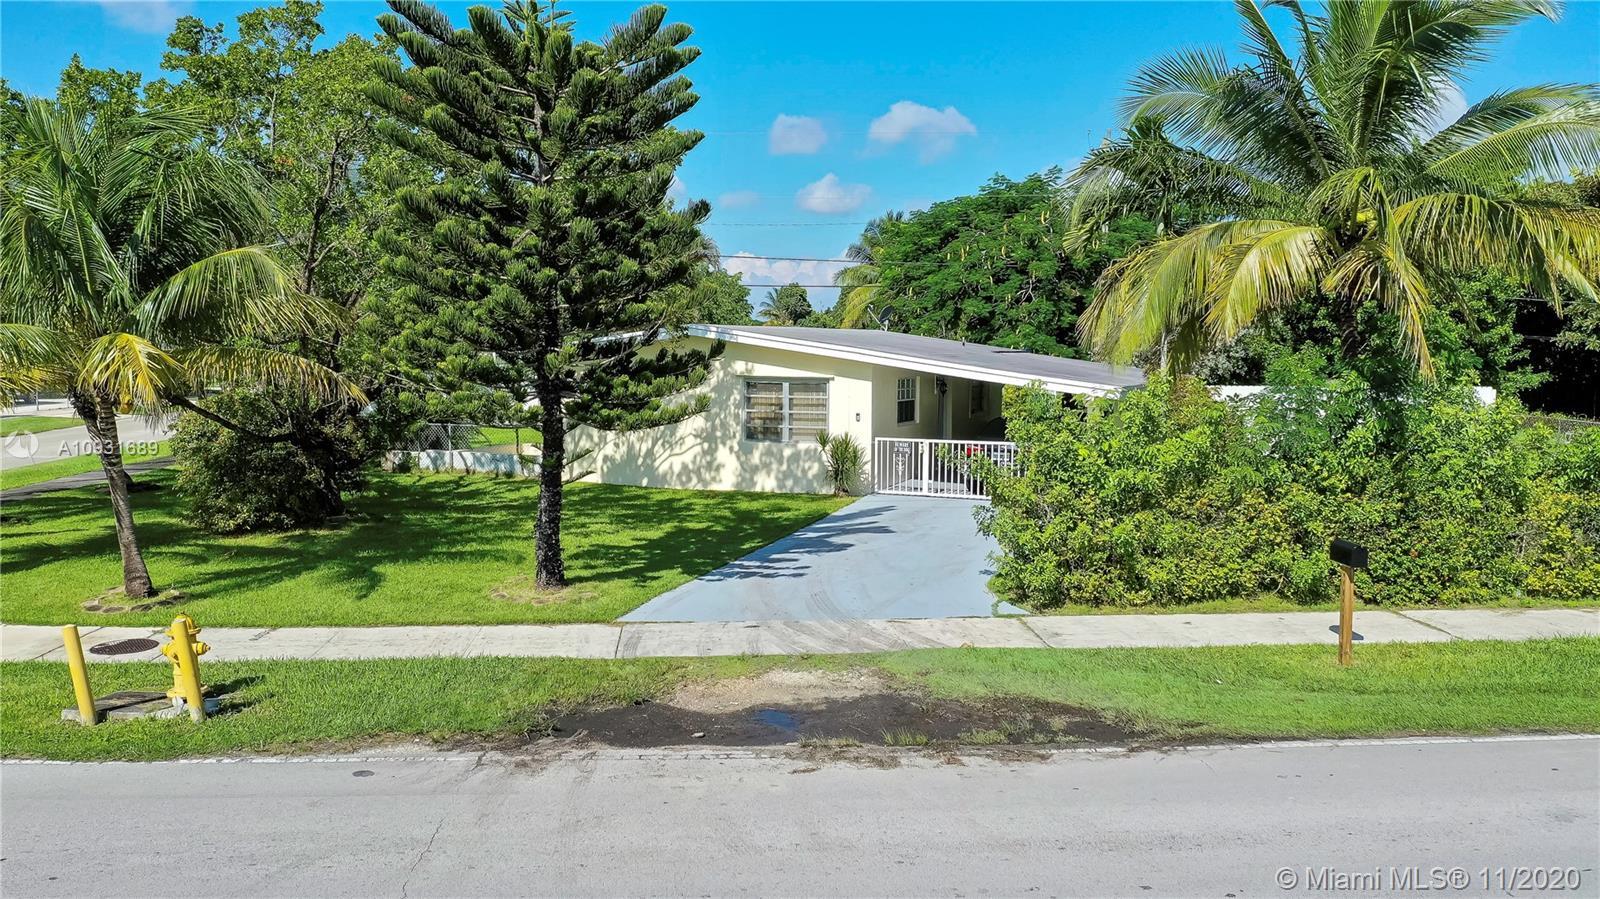 28920 Sw 144 Ave Property Photo